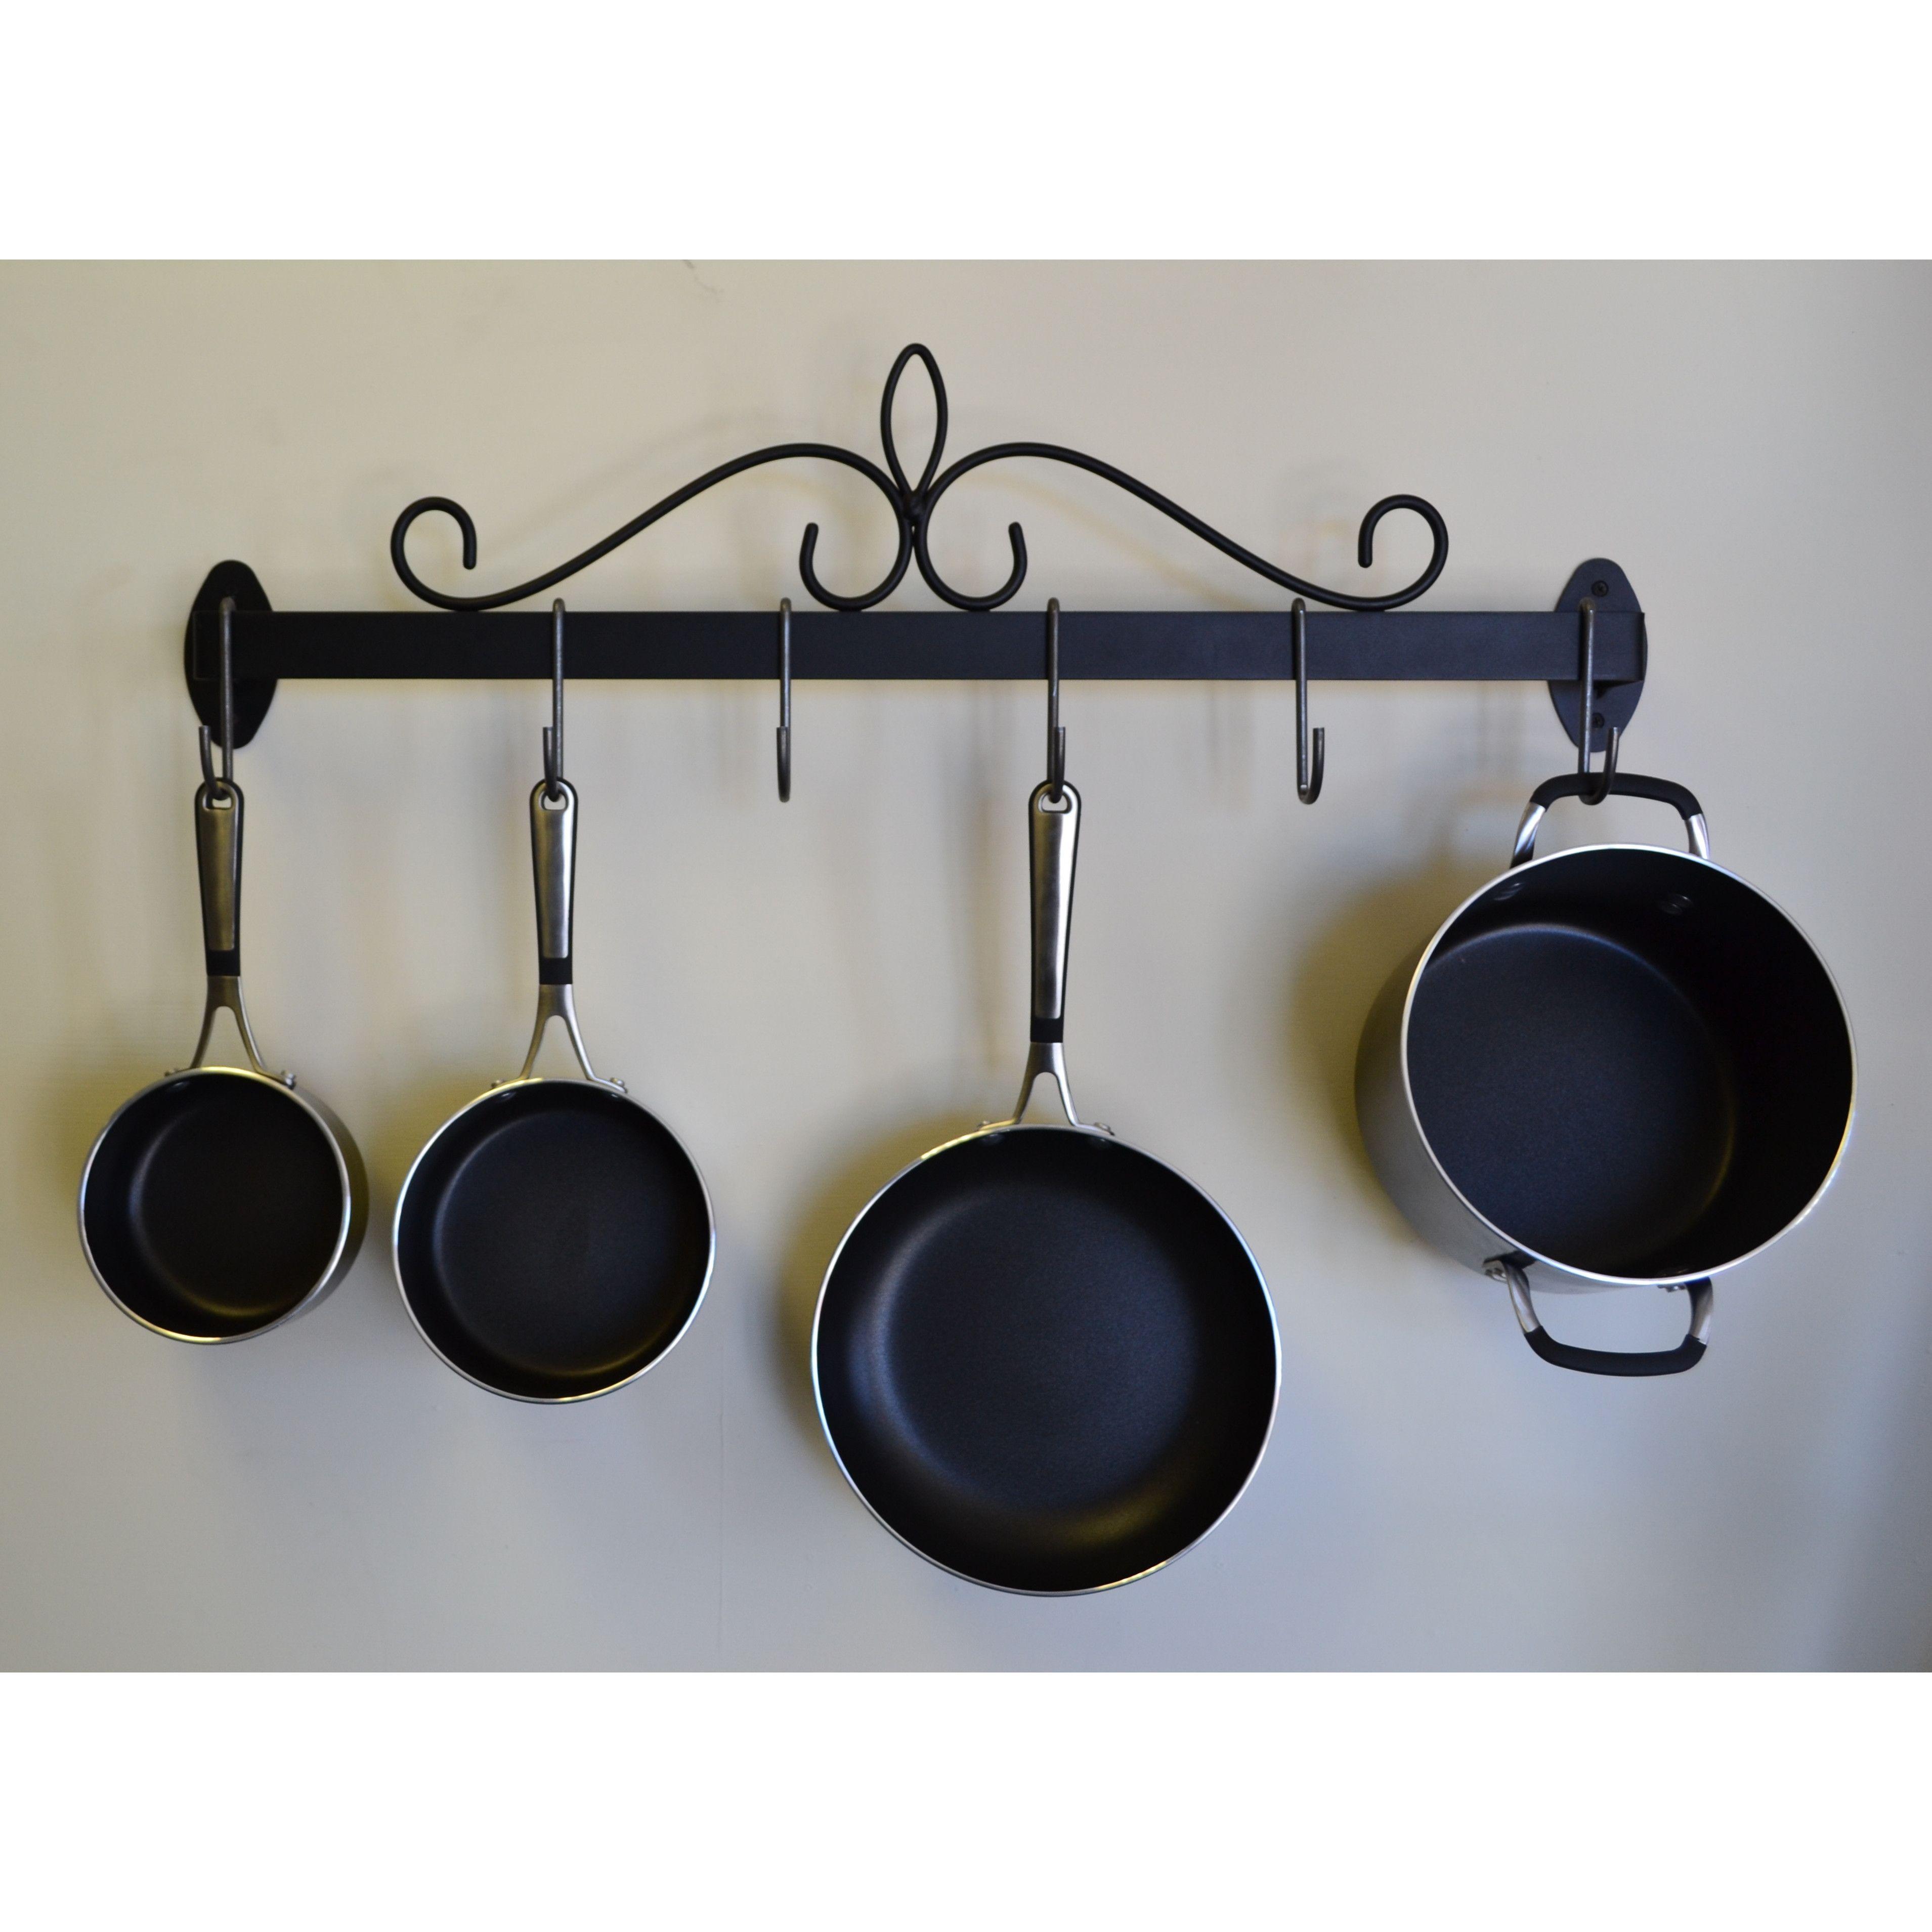 J & J Wire Wall Pot and Pan Rack | kitchen ideas | Pinterest